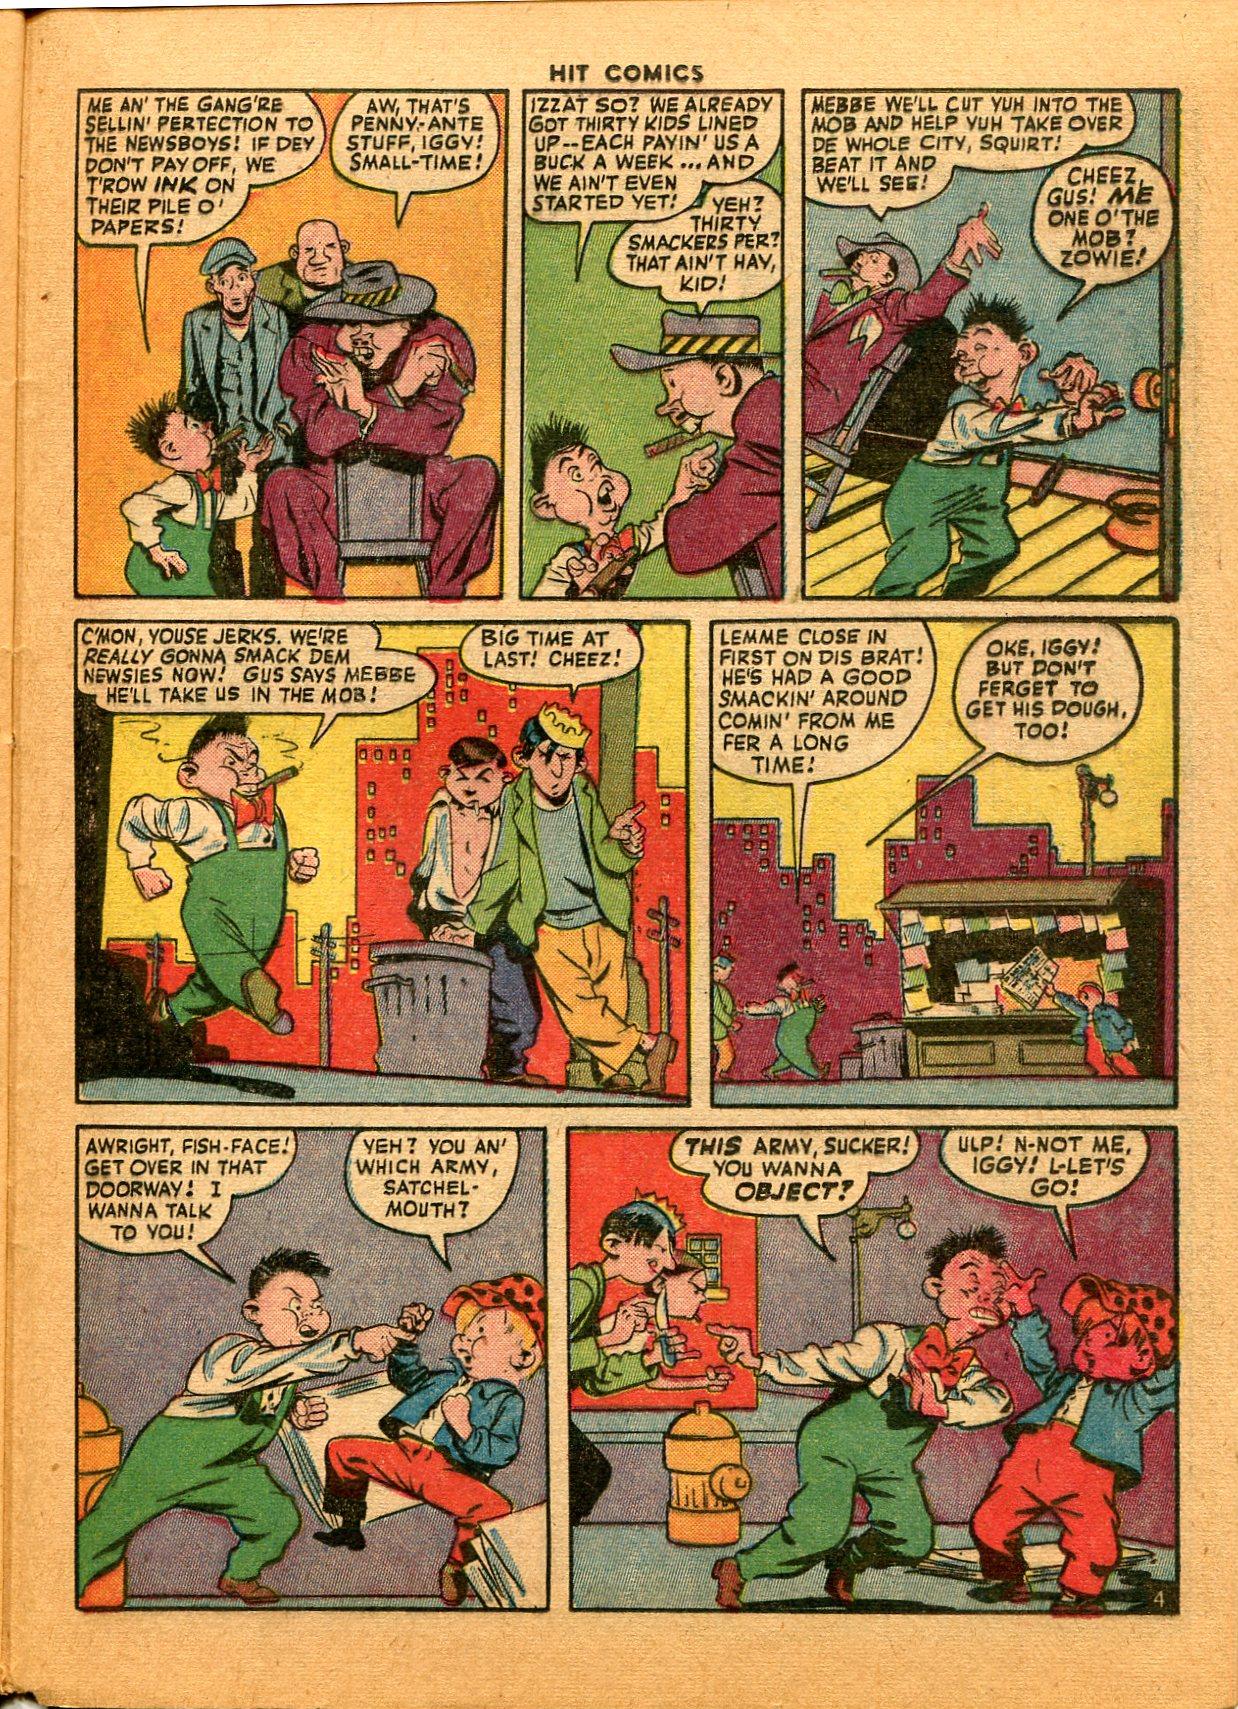 Read online Hit Comics comic -  Issue #35 - 41